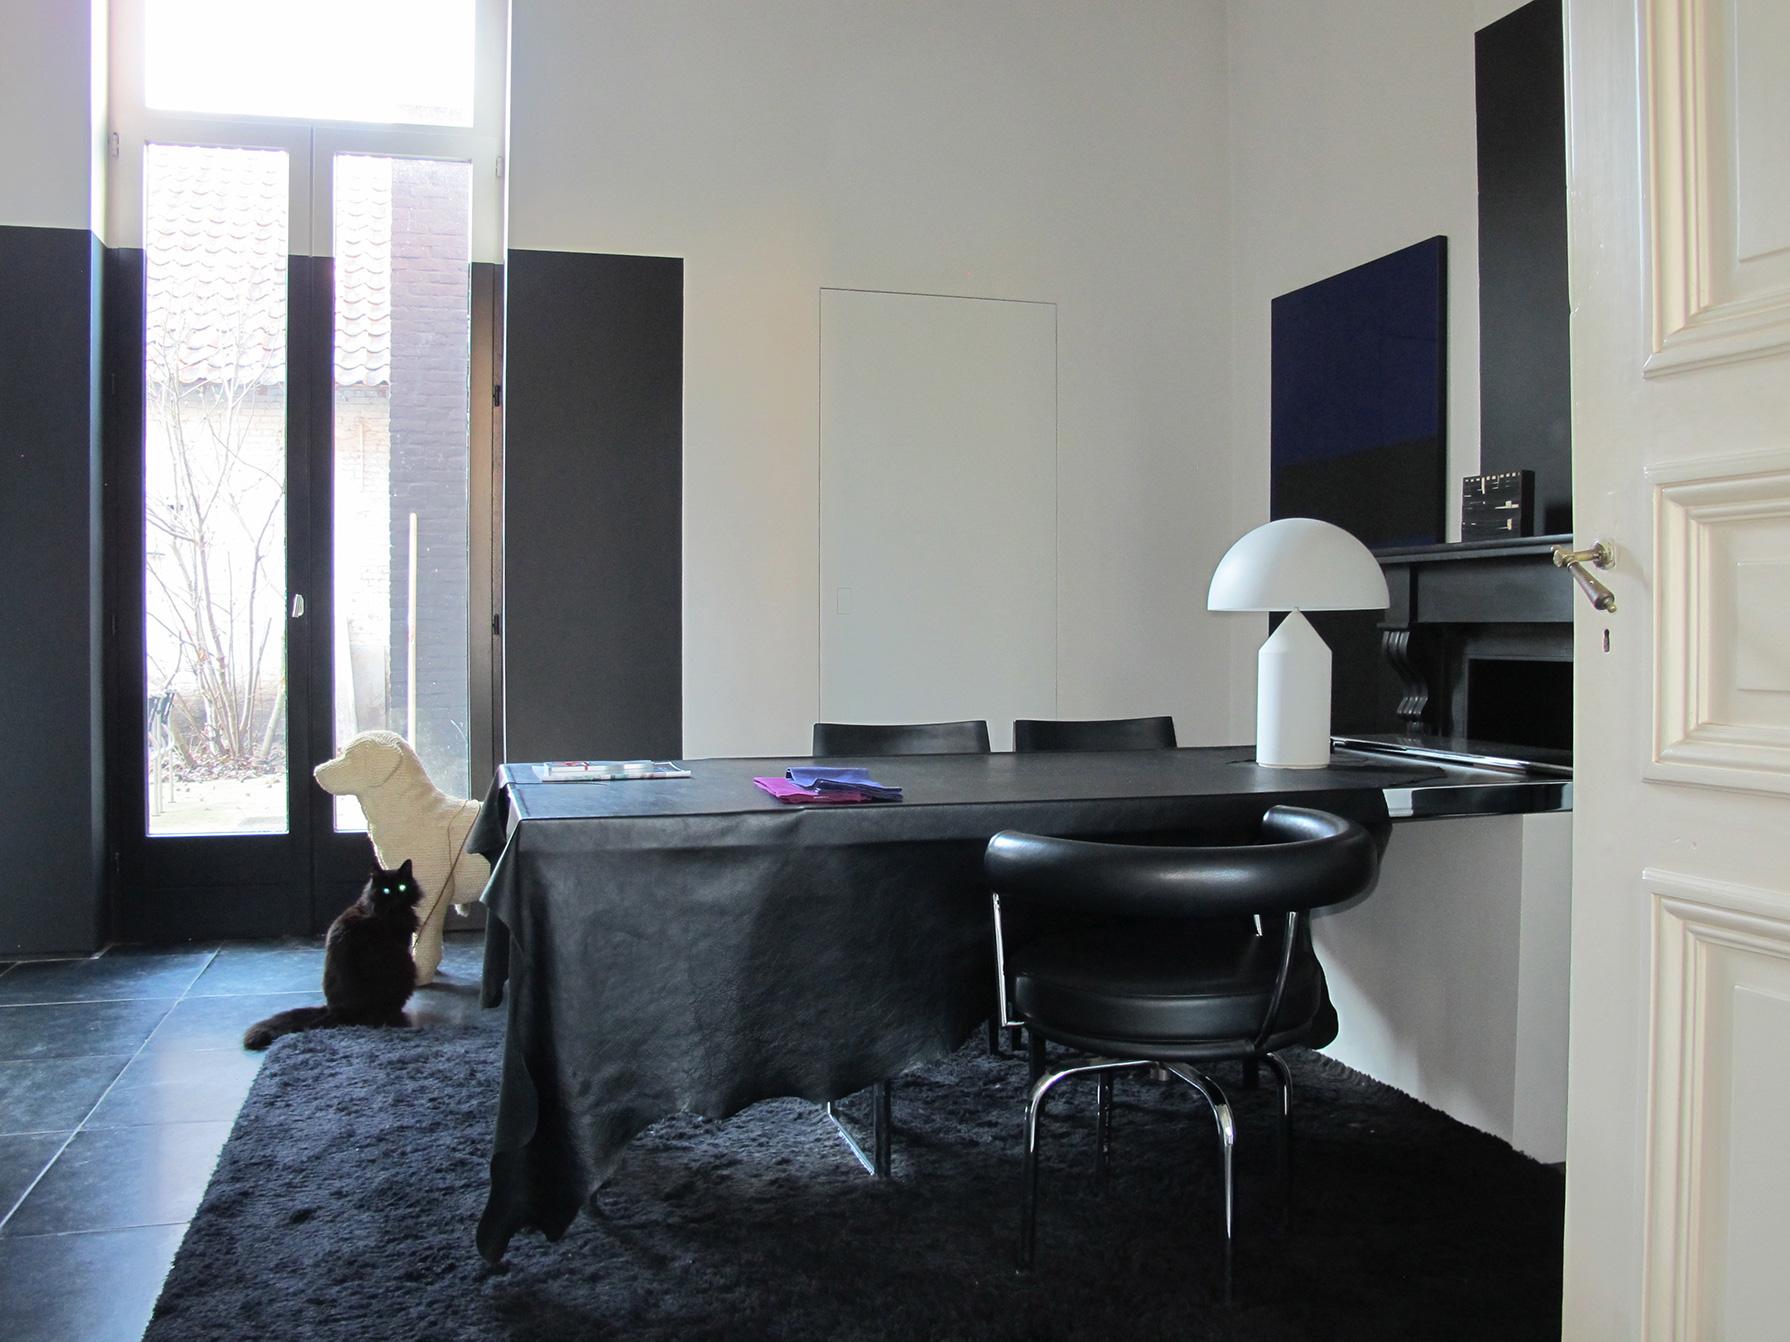 stoel LC7 / tafel ospite van Charlotte Perriand/ stoel laleggera/tapijt sauvage